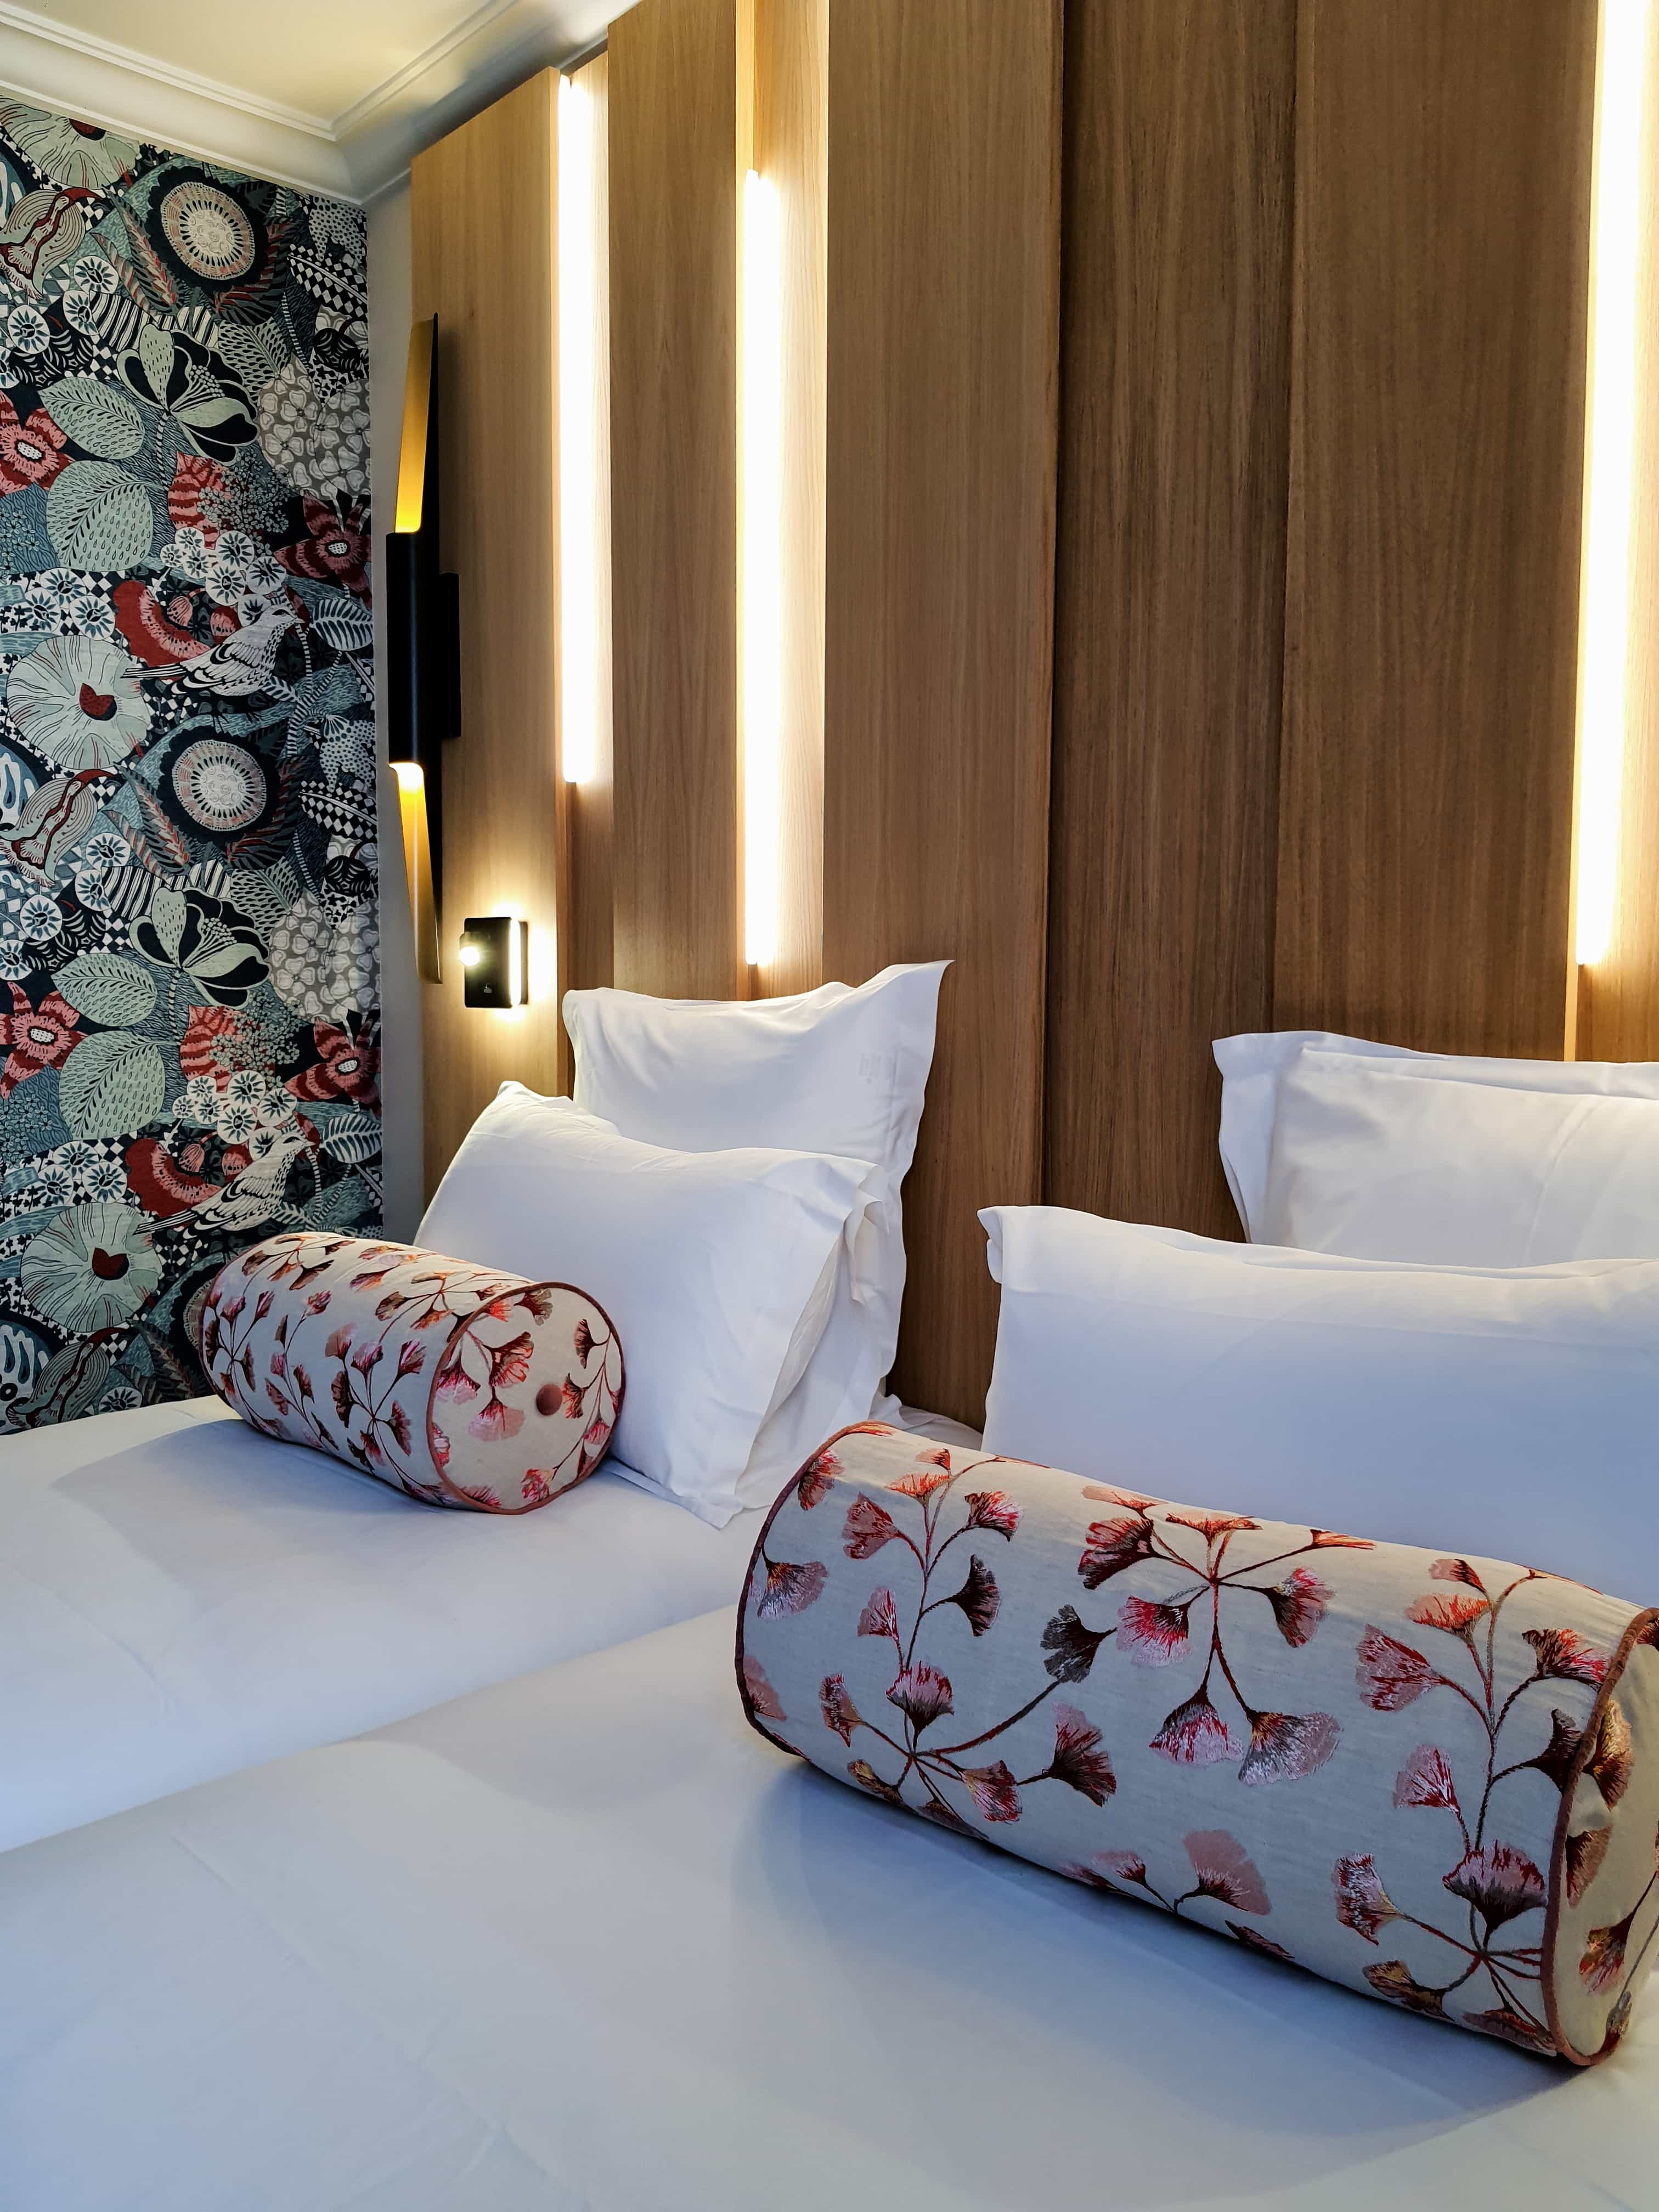 Hotel Prelude Opera AJG Menuiserie 2